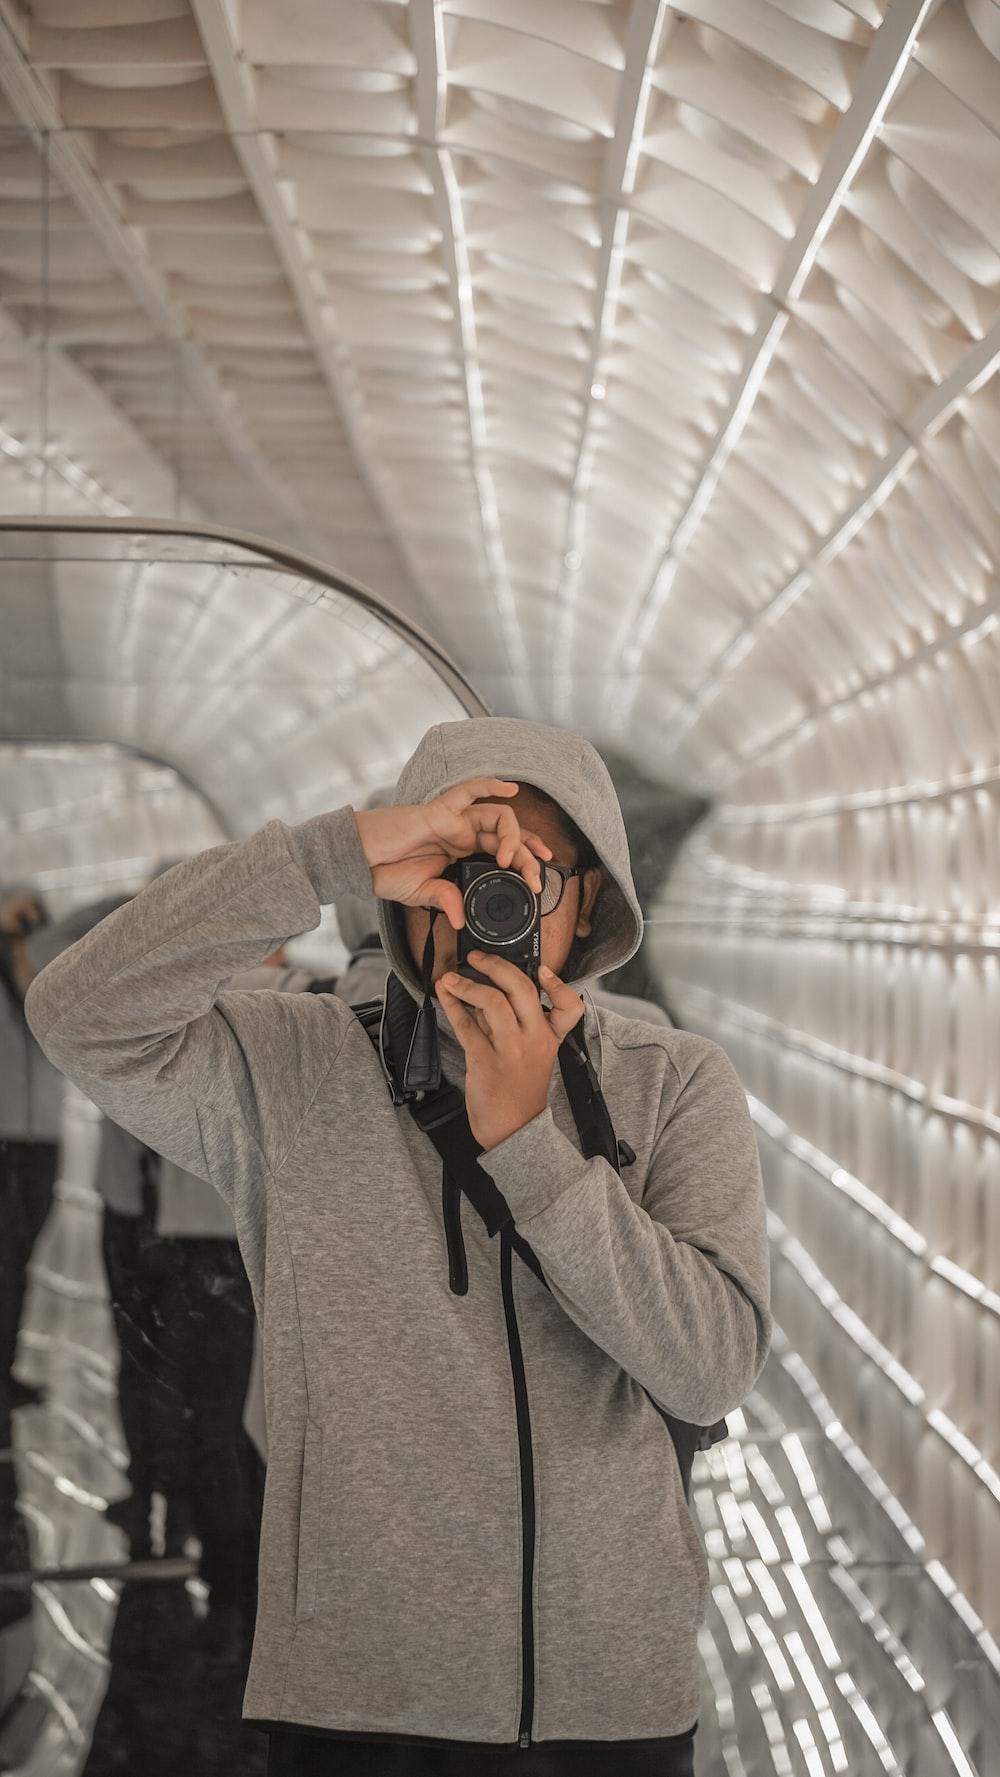 man using camera